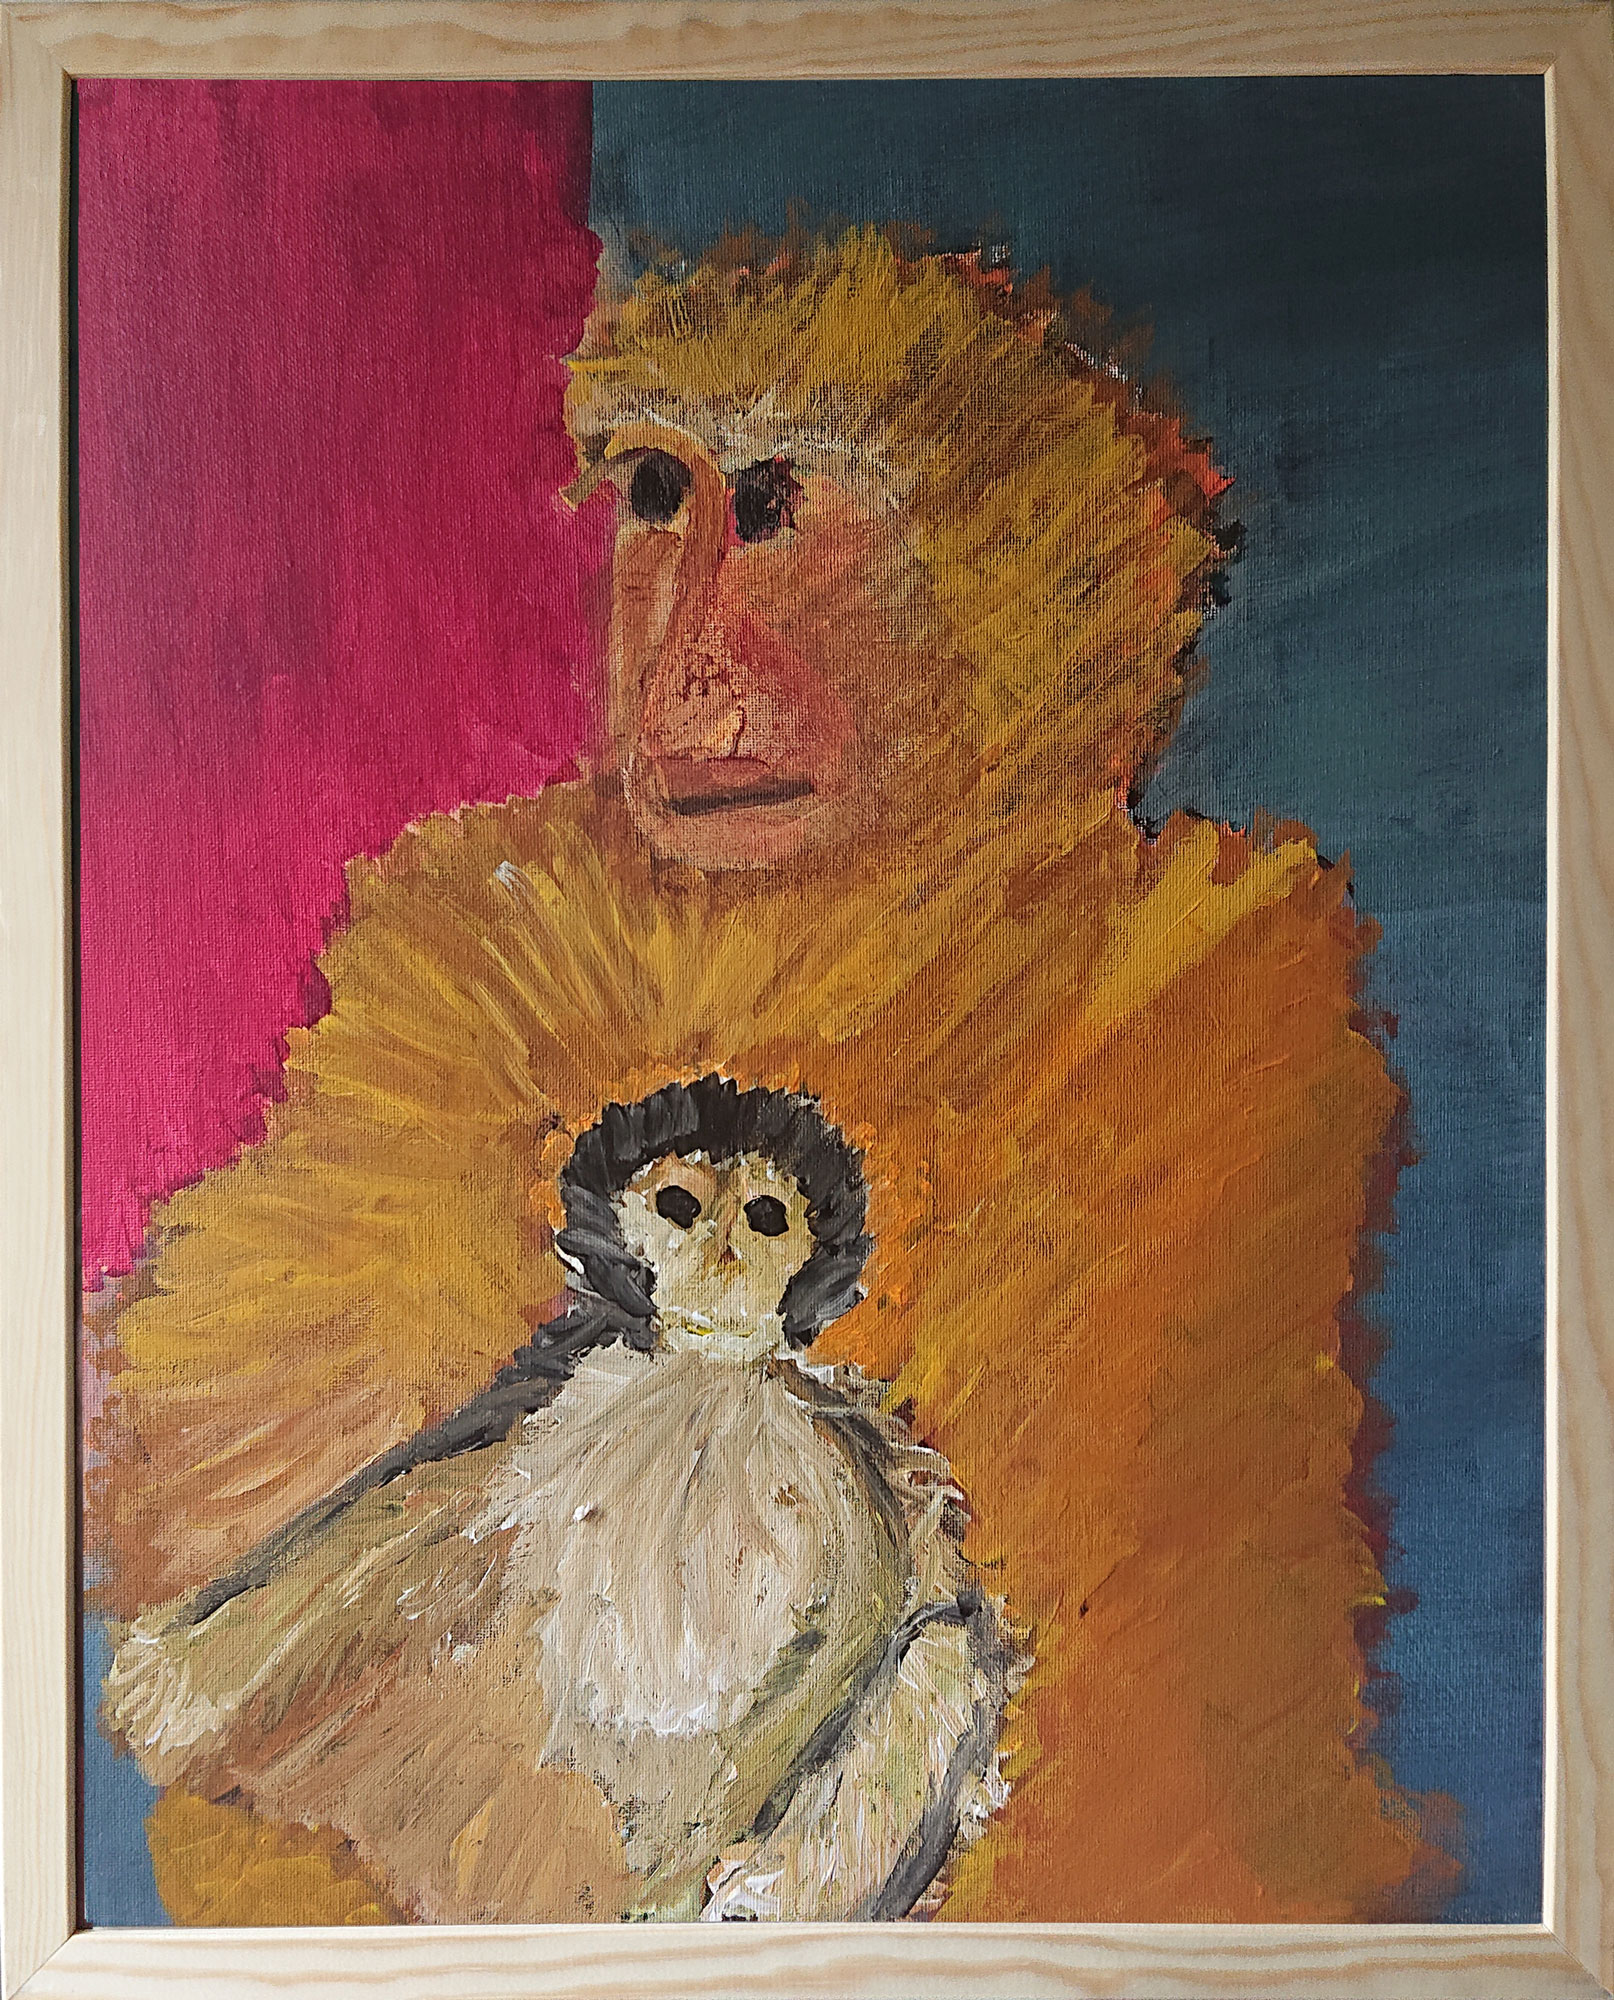 Macaques de Barbarie 2 50x40 cm acrylique sur carton entoilé 2019